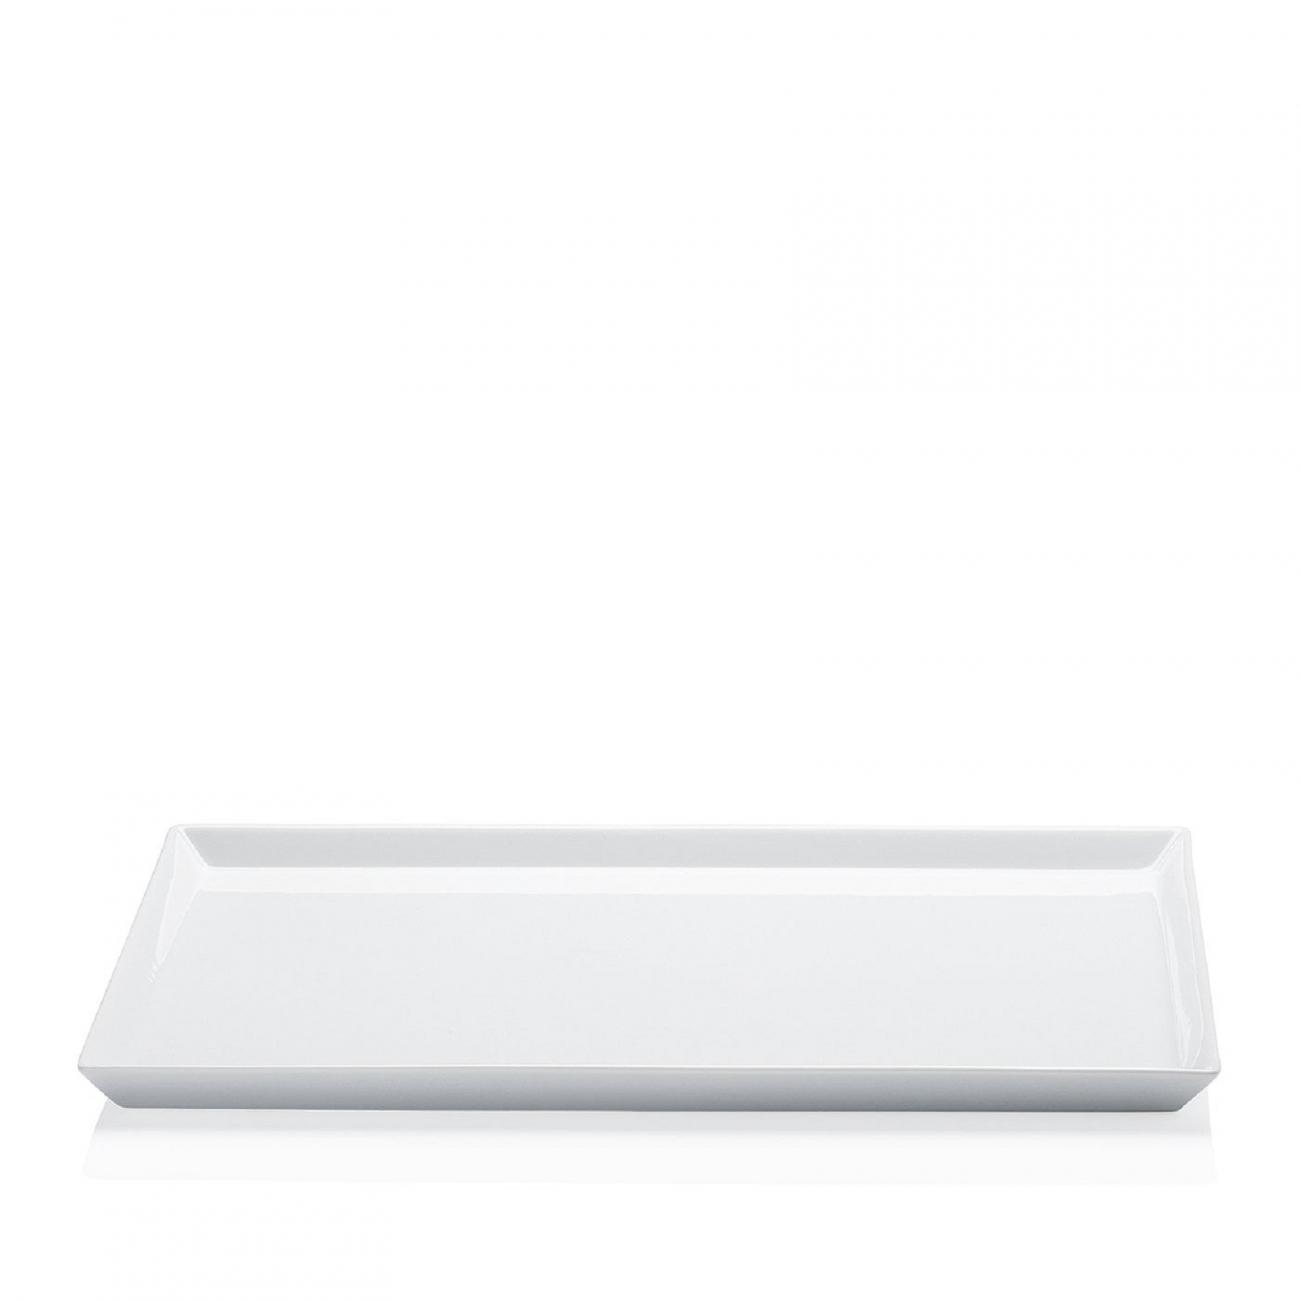 Arzberg Tric Serving Platter